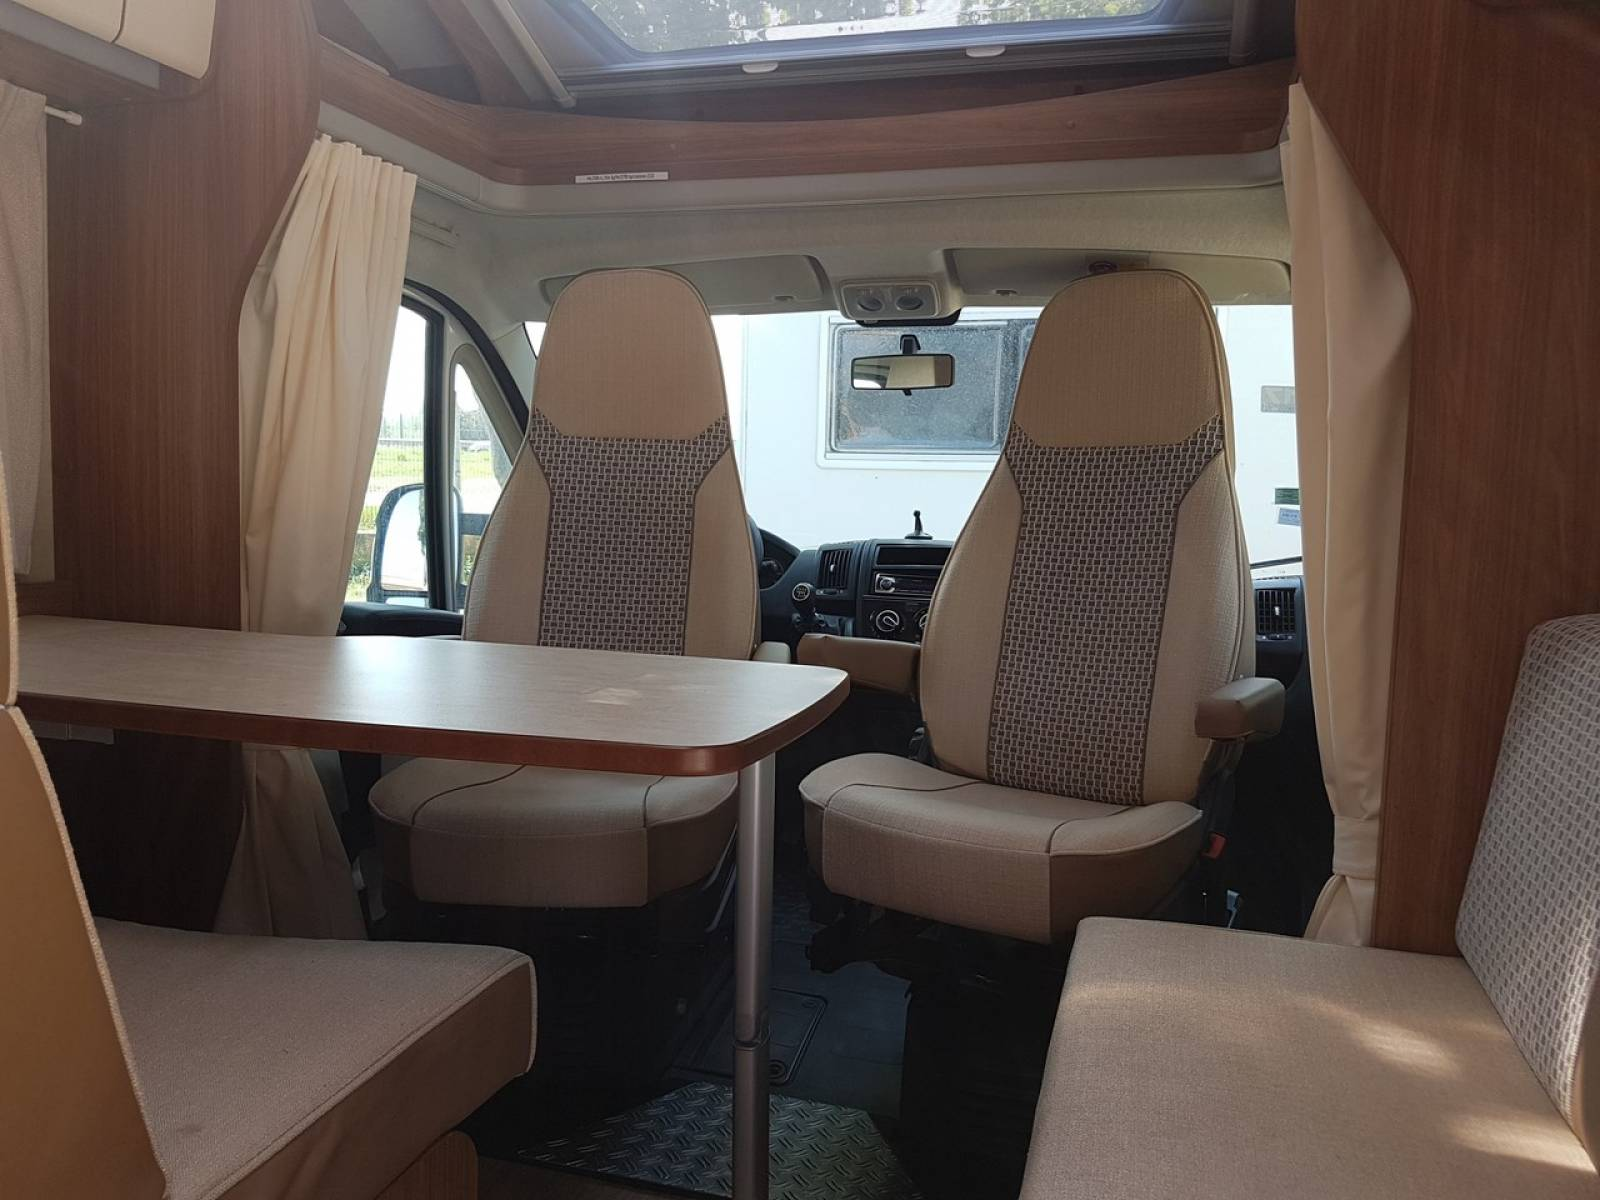 vendu carado t345 vente camping car neuf et occasion lan on de provence midi 13 loisirs. Black Bedroom Furniture Sets. Home Design Ideas